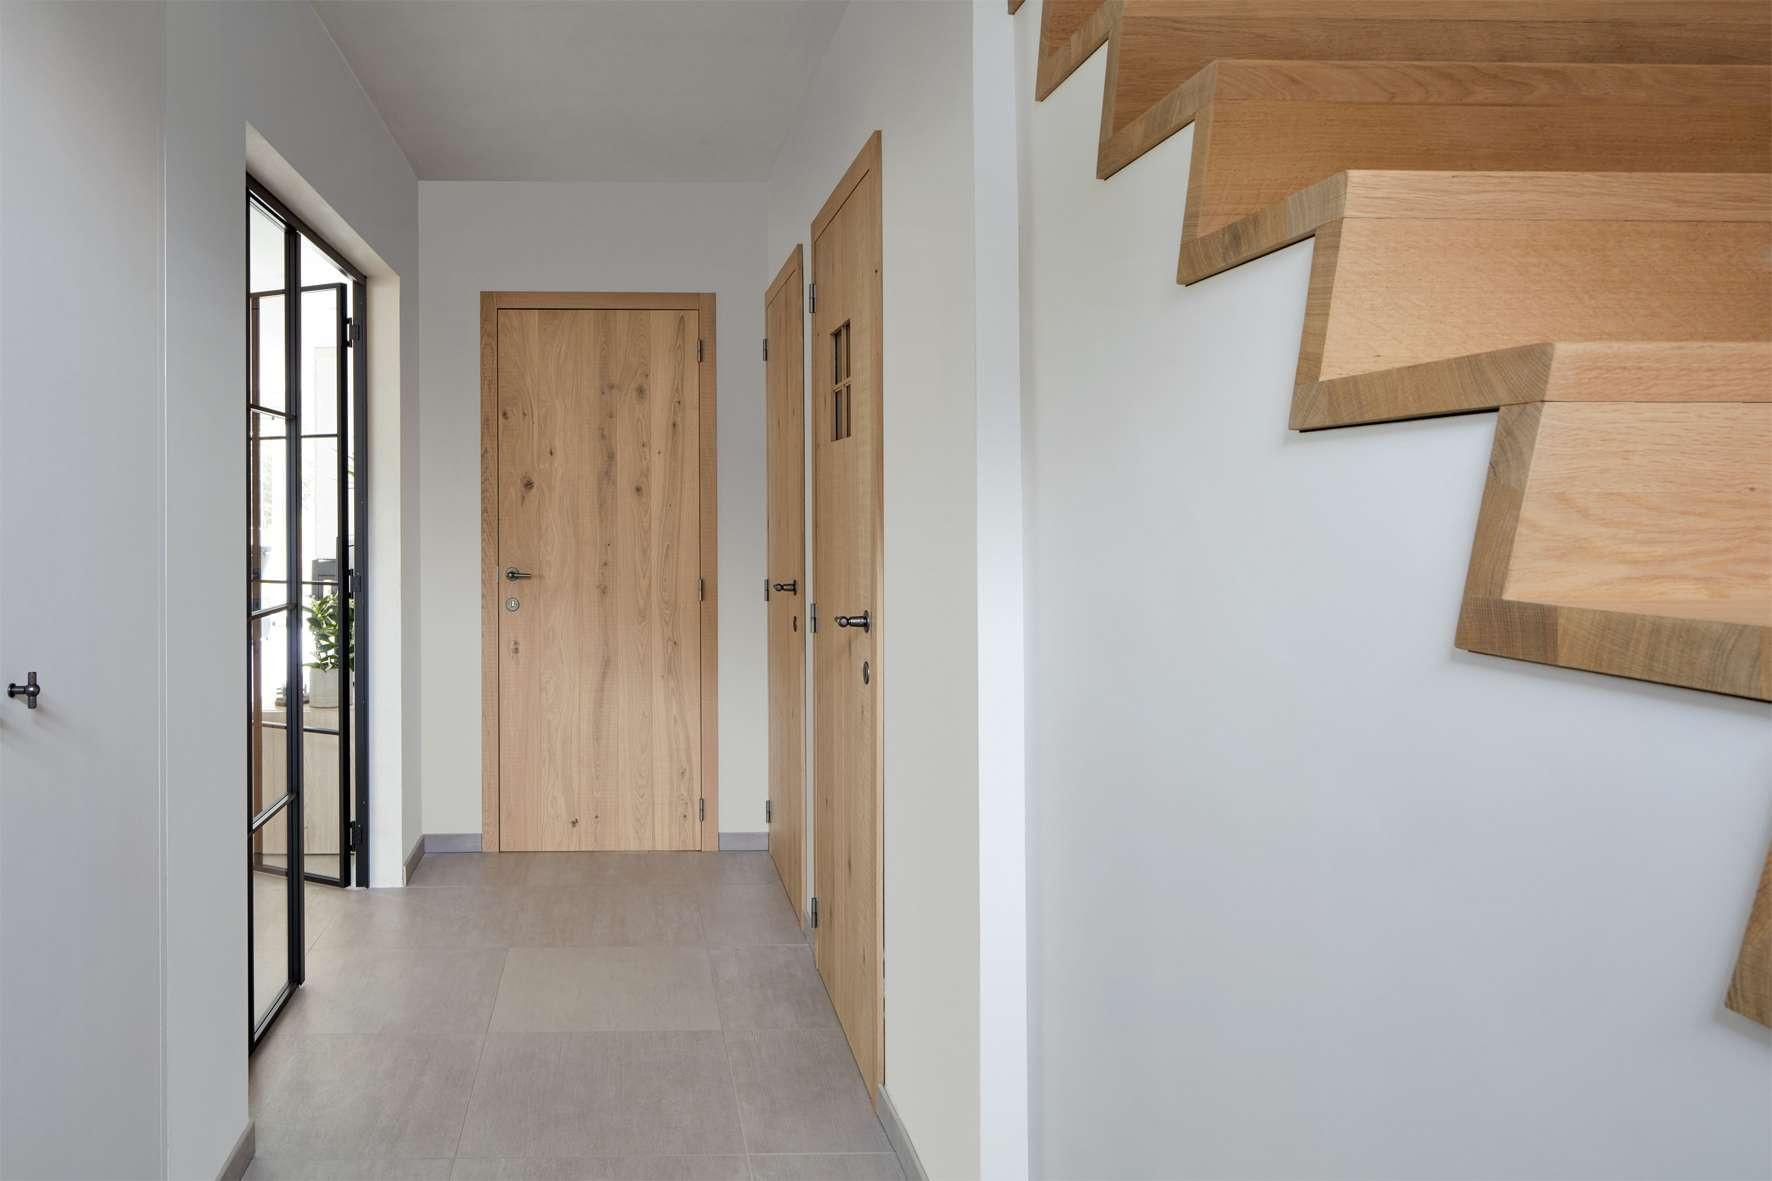 Z-trap-plankendeur-hout-steellook-binnendeuren